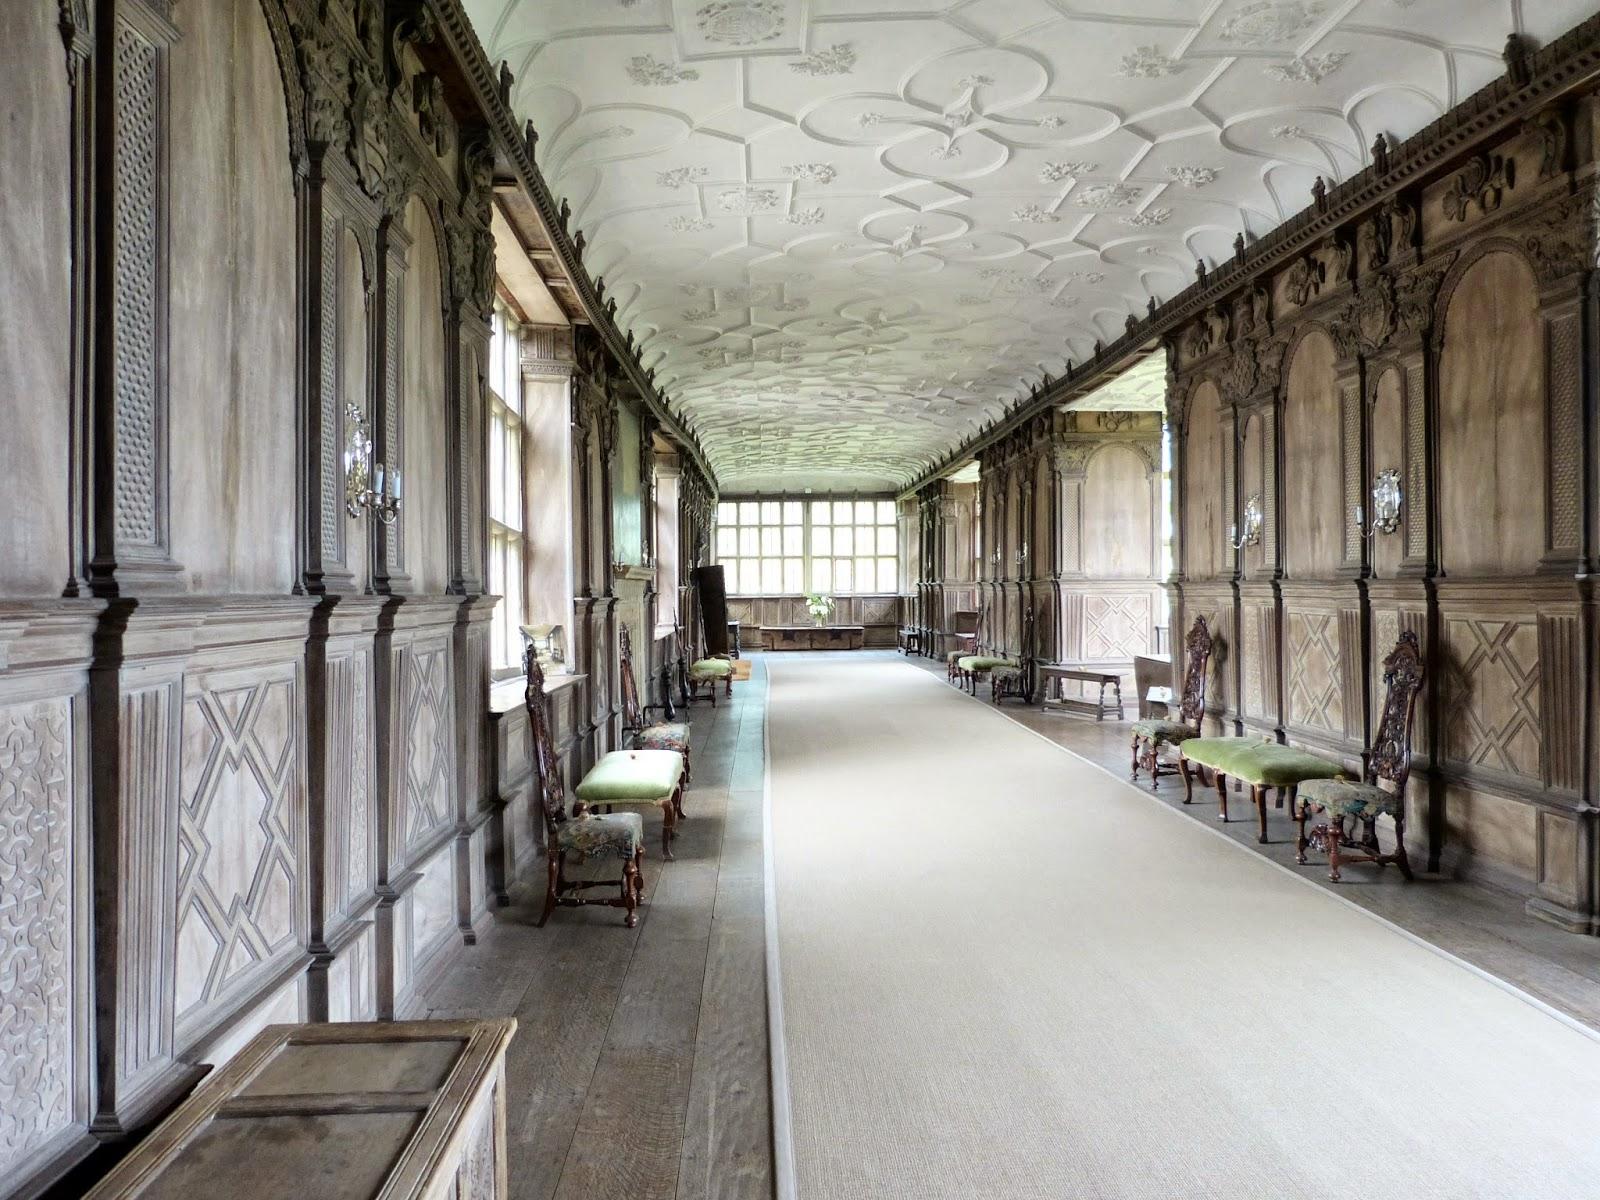 The Long Galllery, Haddon Hall